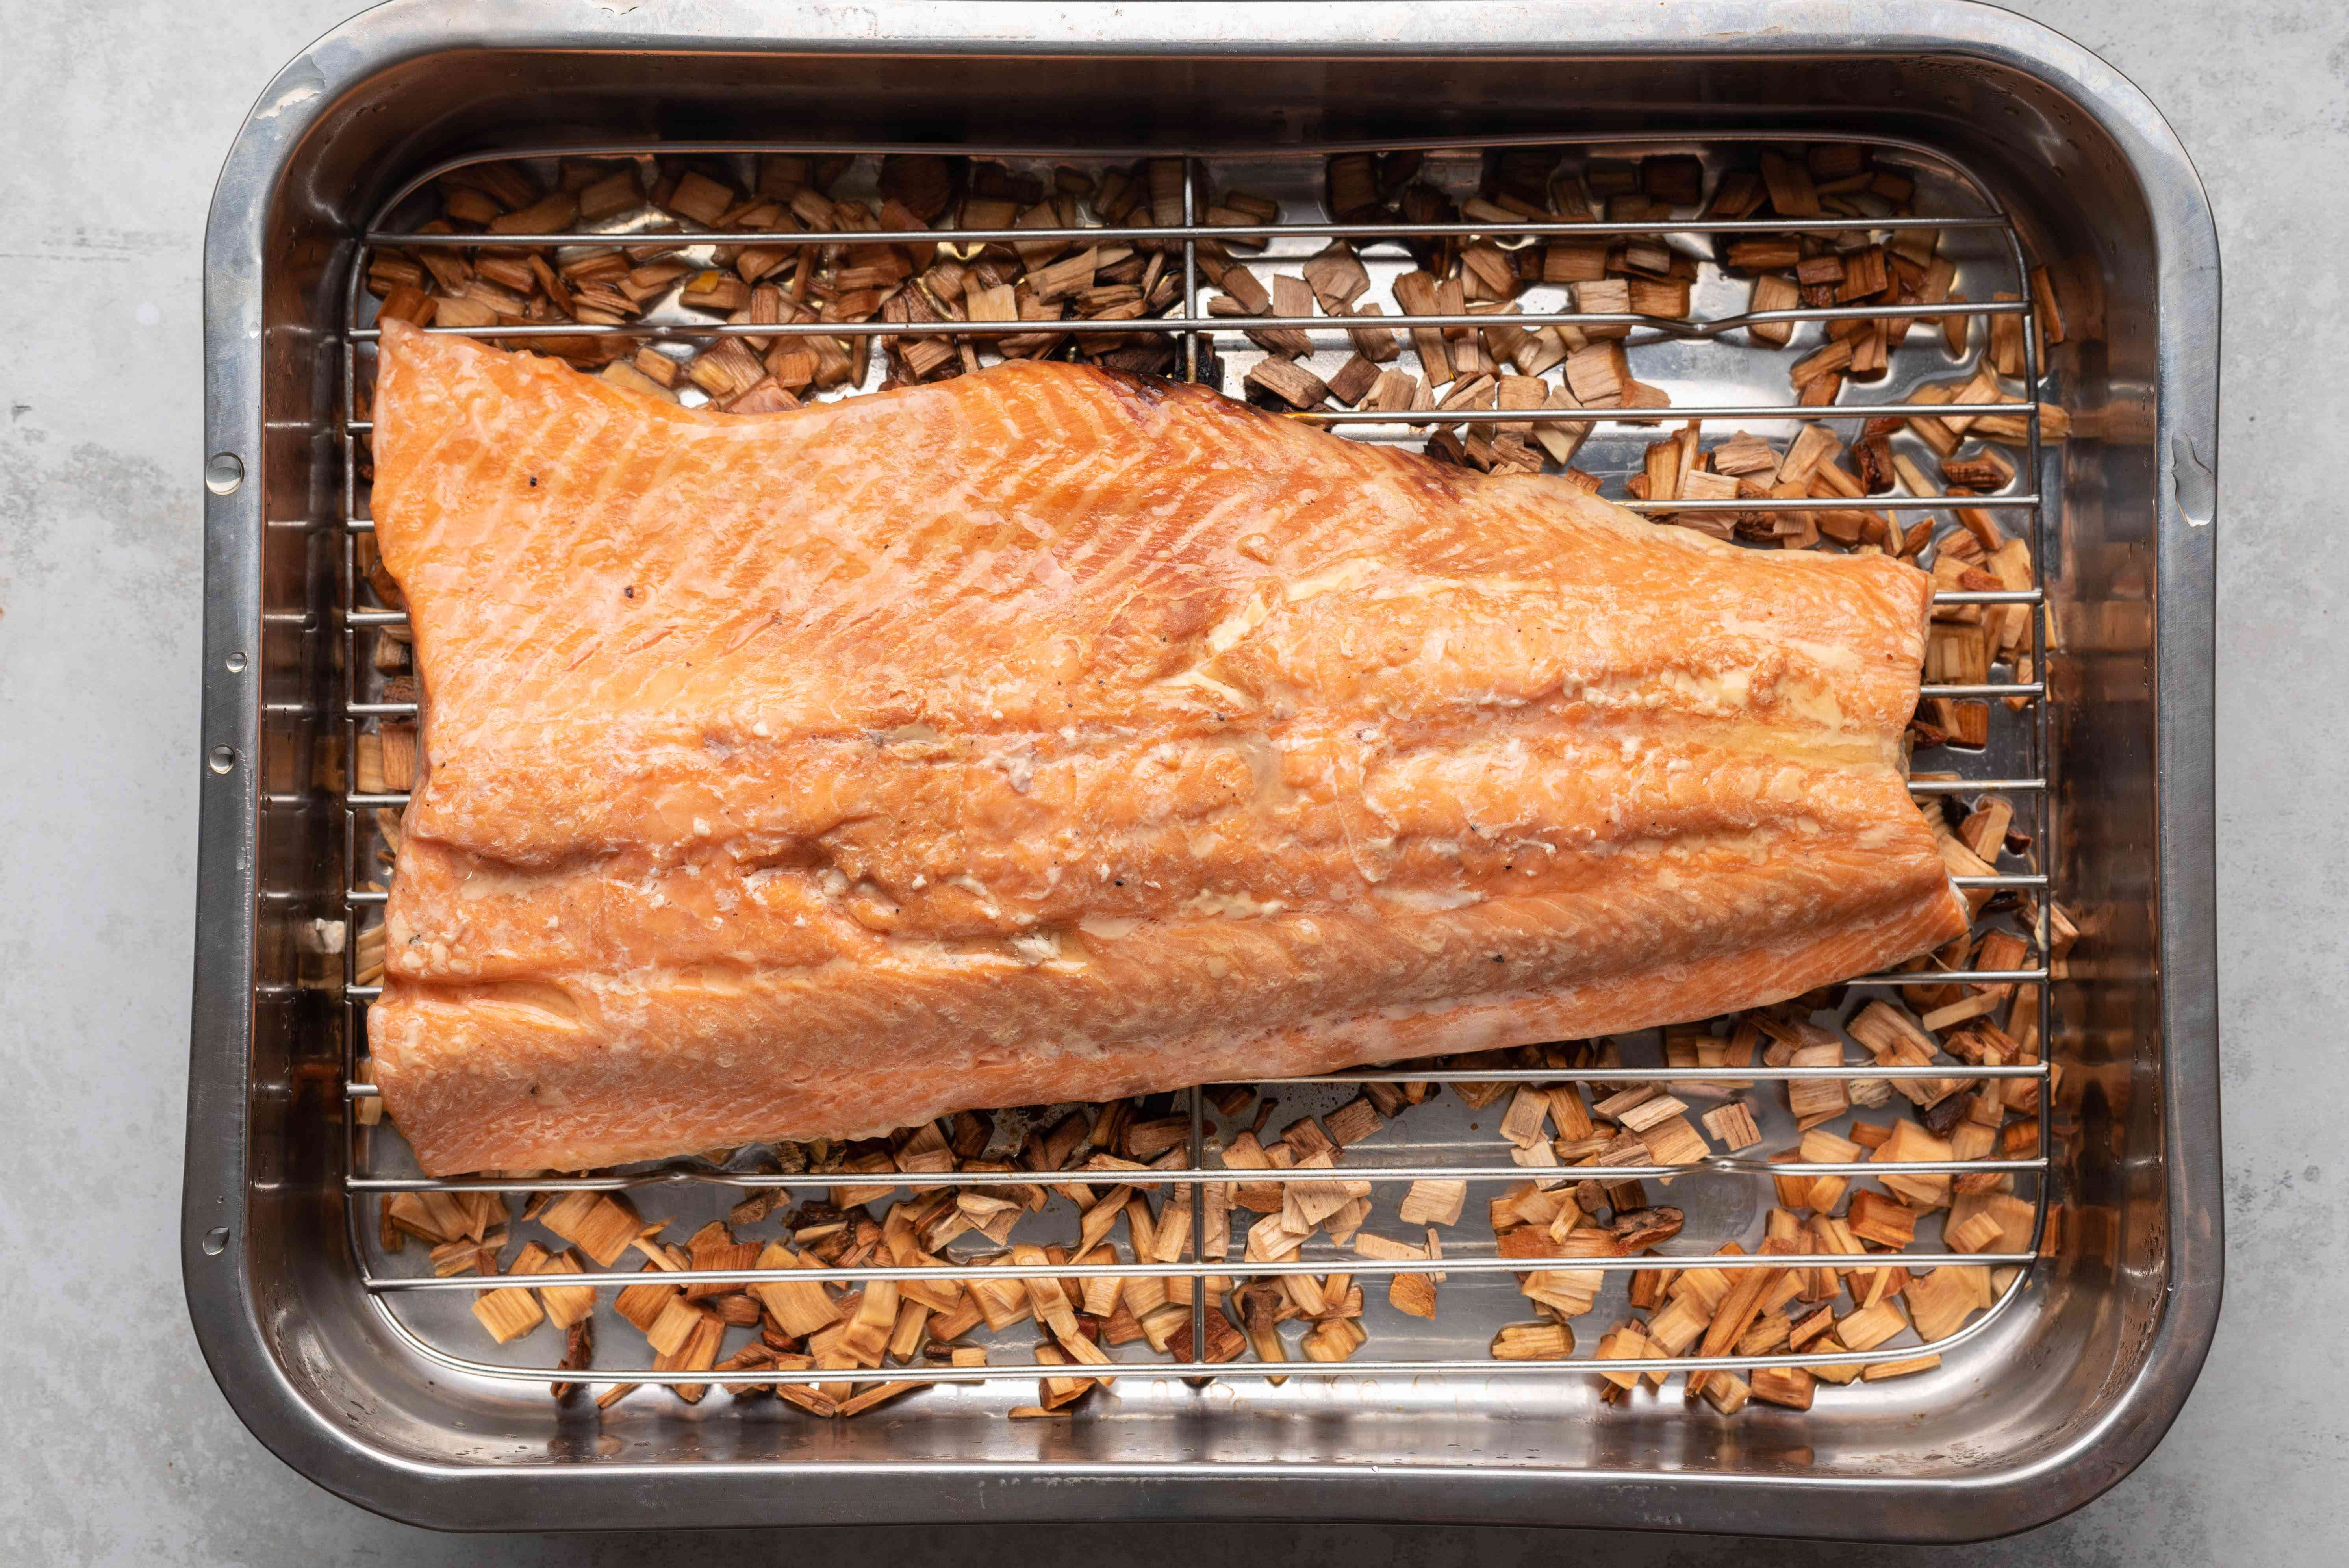 Stove Top Smoked Salmon in a roasting pan